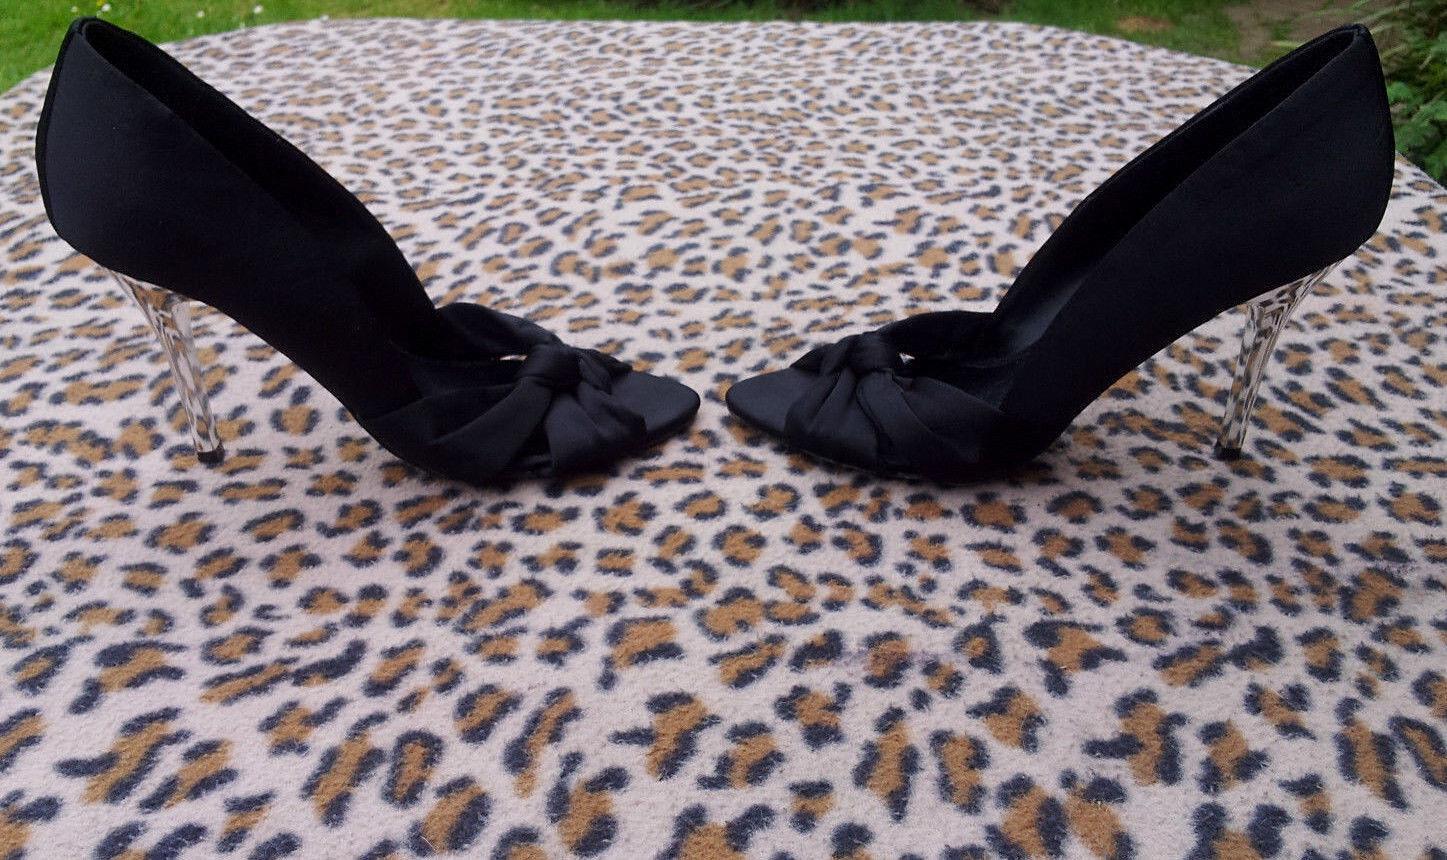 Carvela schwarz high UK heeled schuhe EU Größe 38, UK high 5 84c246